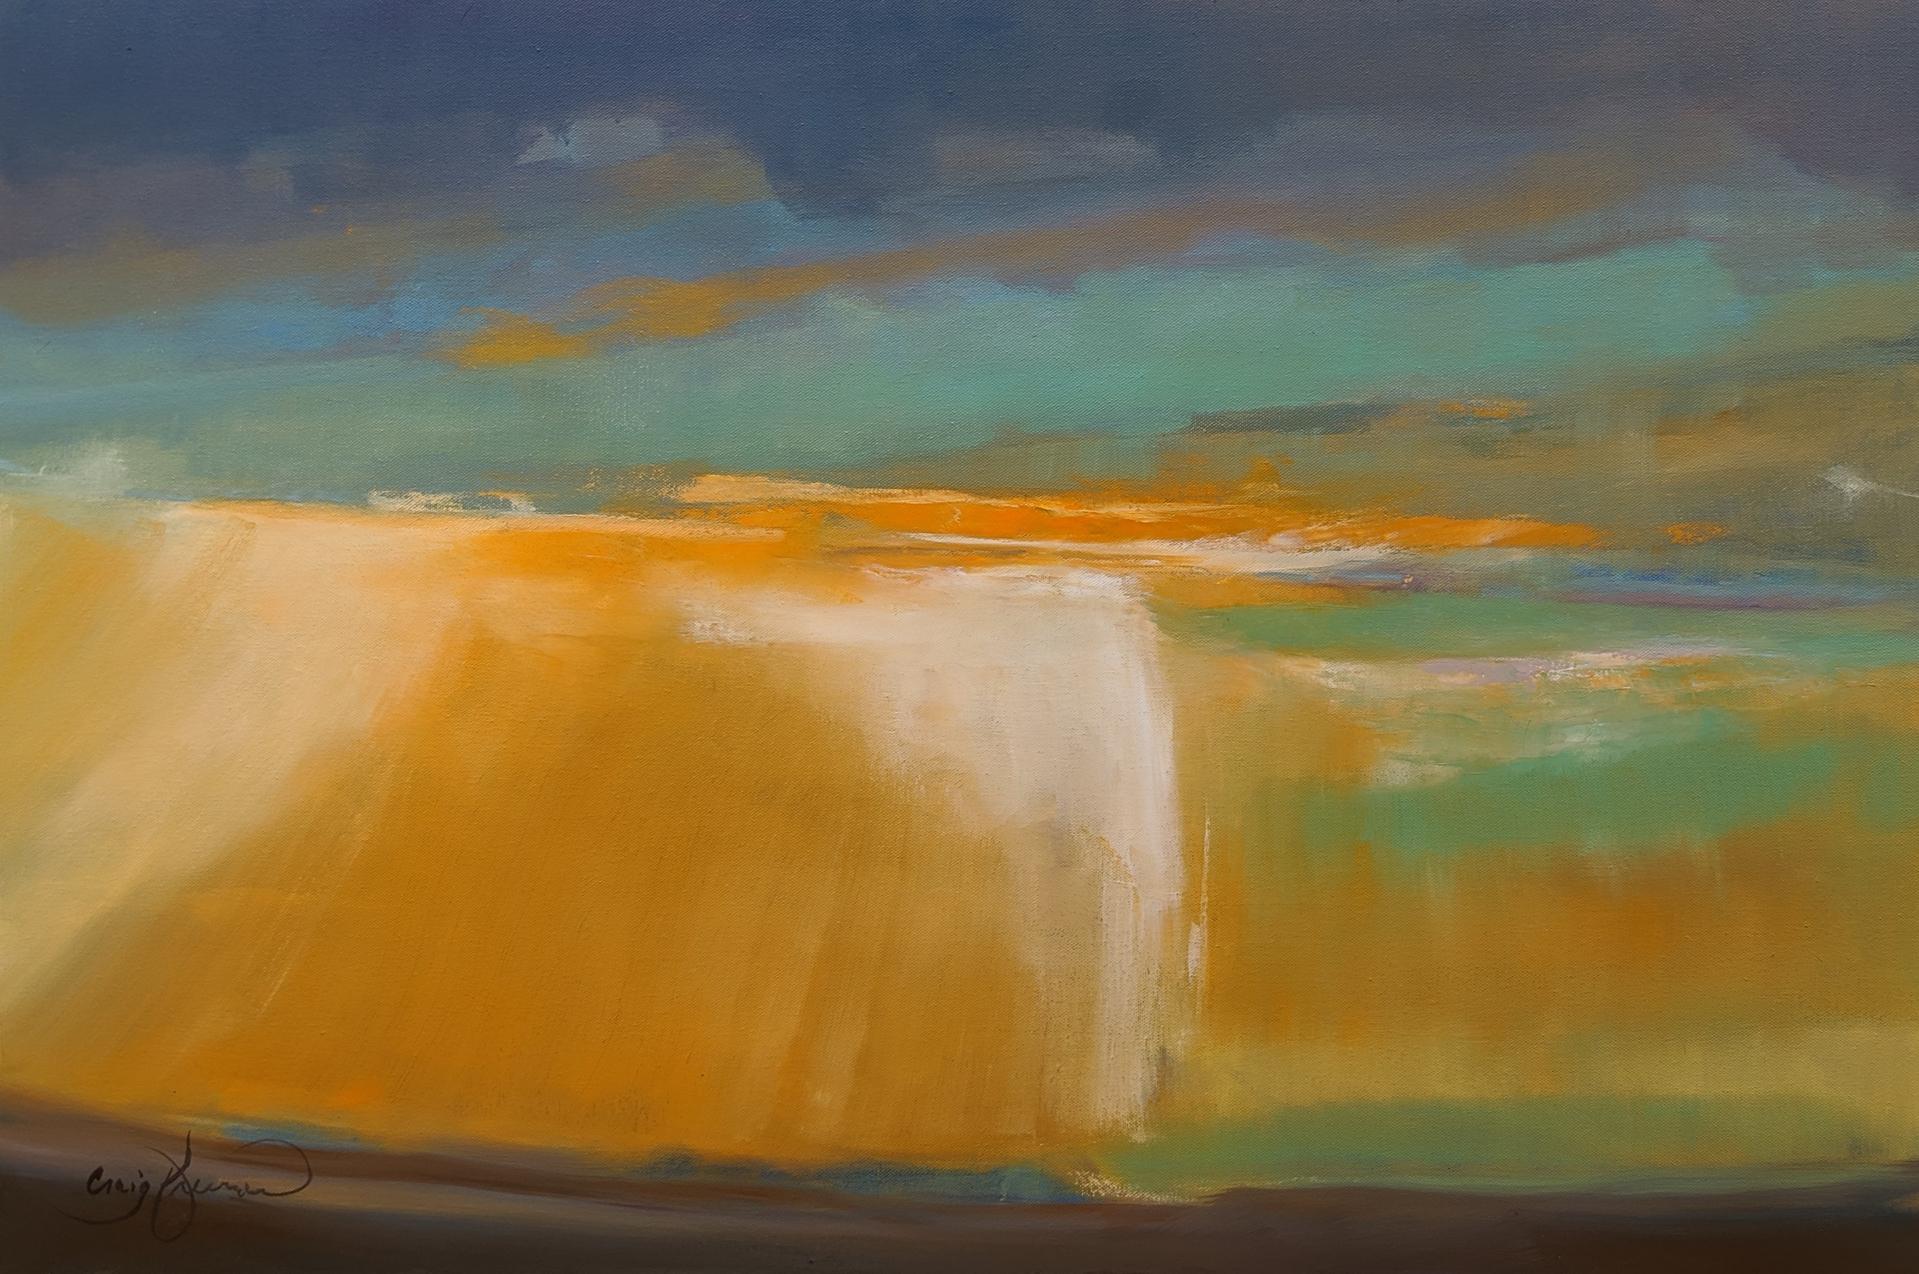 Desert Light by Craig Freeman